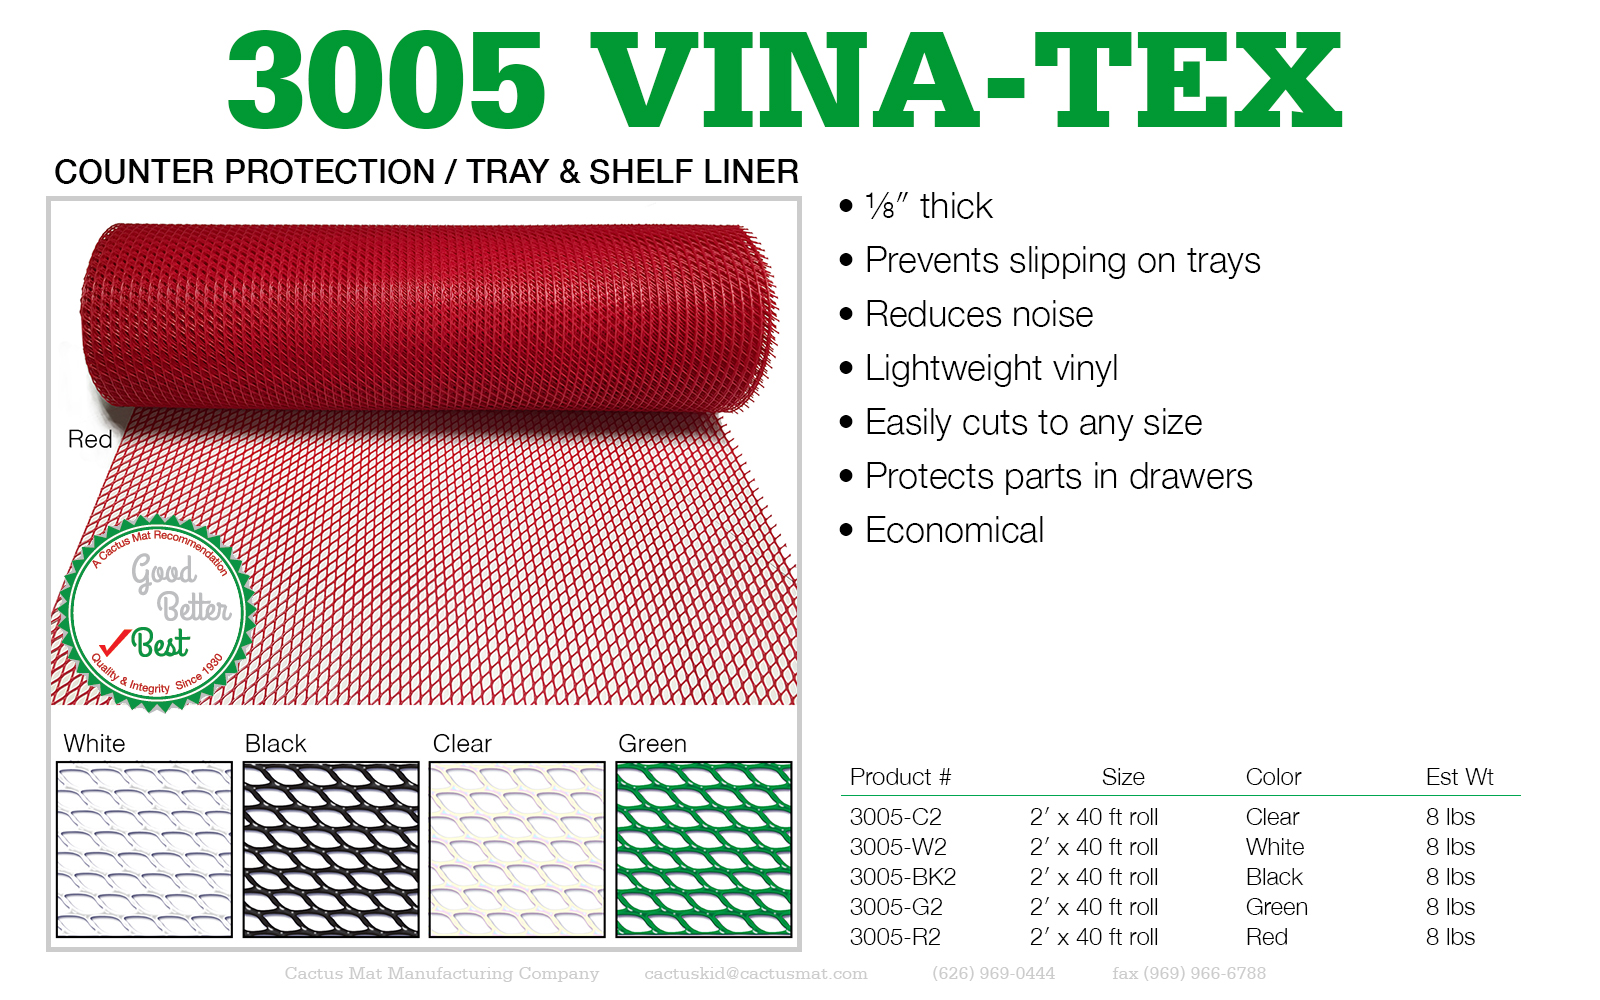 3005_VinaTex_1600x1000.jpg